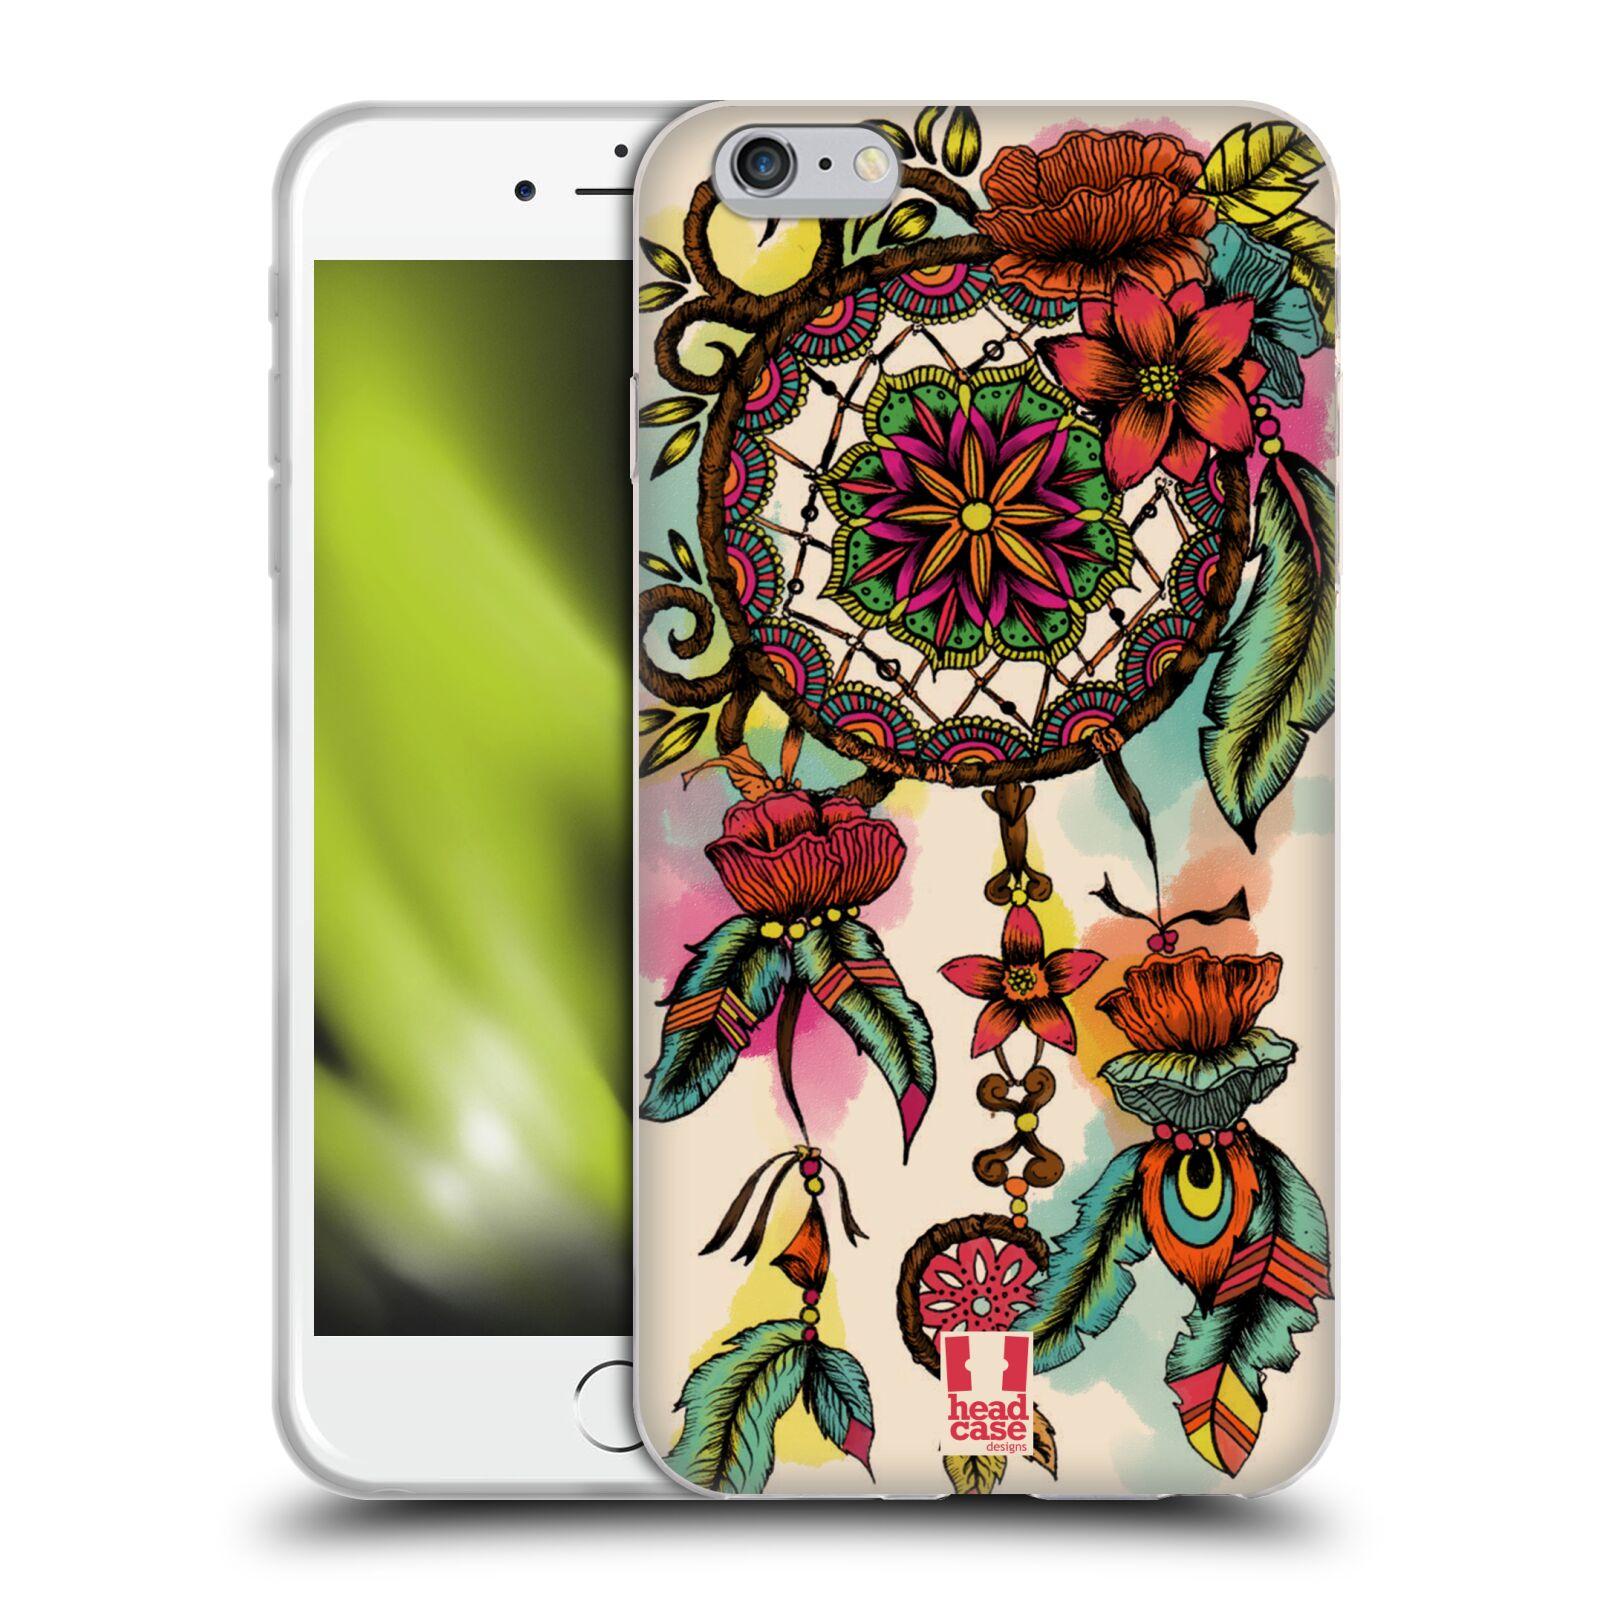 HEAD CASE silikonový obal na mobil Apple Iphone 6 PLUS/ 6S PLUS vzor Květy lapač snů FLORID